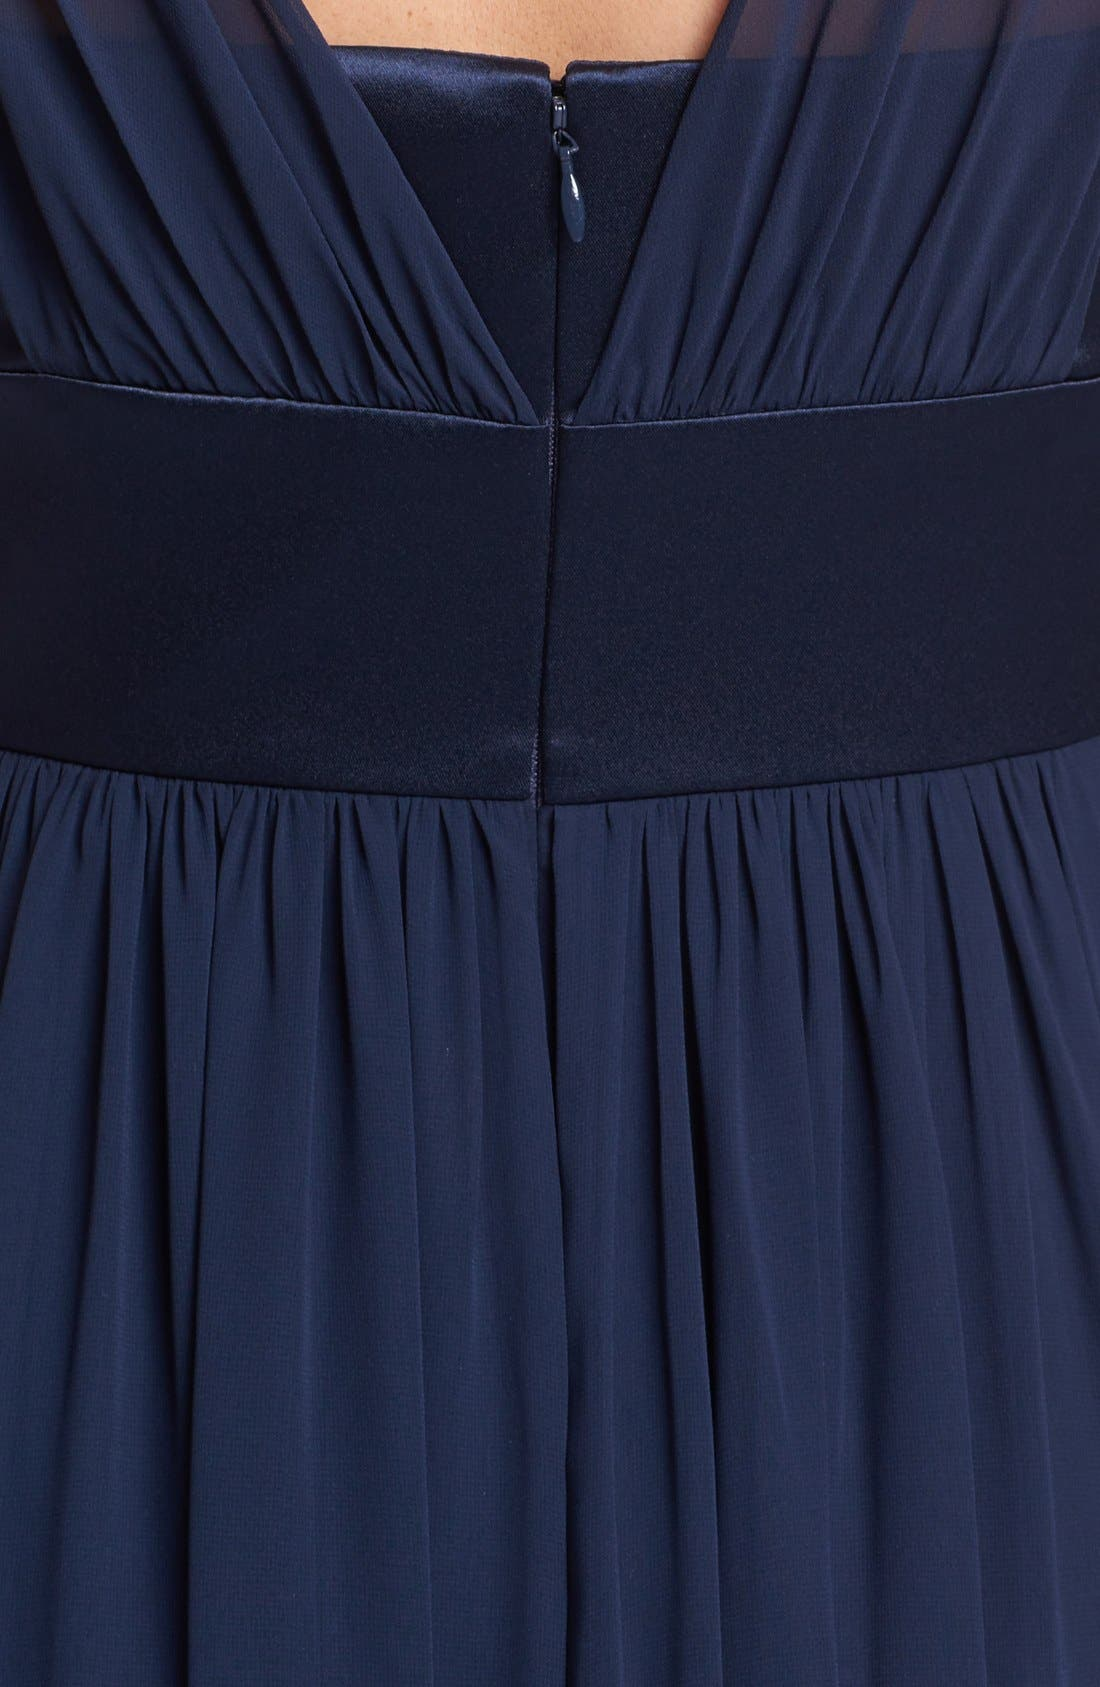 Alternate Image 3  - Dessy Collection Satin & Chiffon Dress